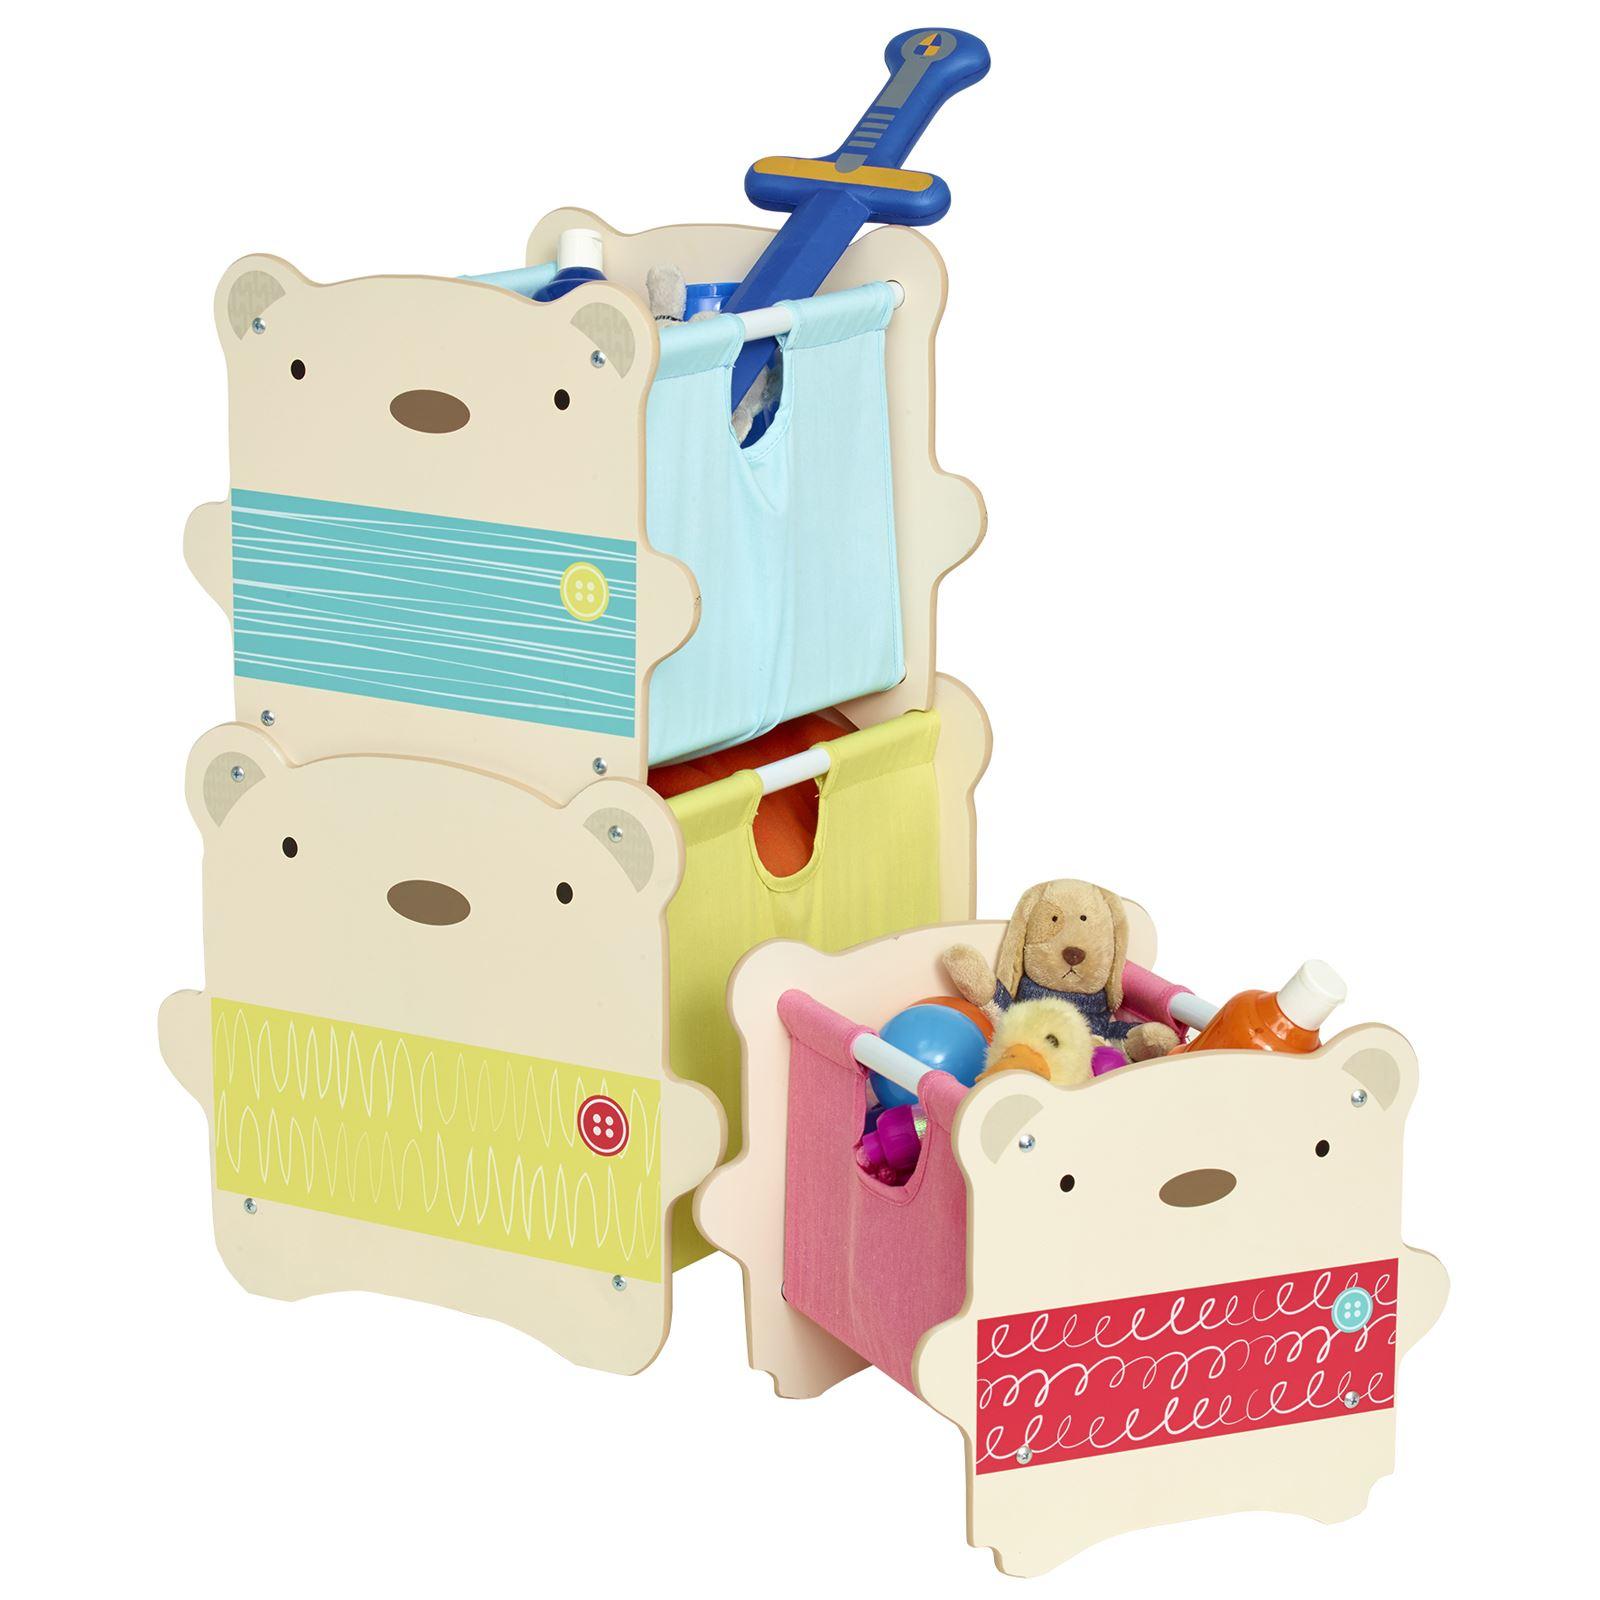 Kids Storage Cube Organizer Toy Box Kids Bedroom Furniture: BEAR HUG KIDS BEDROOM FURNITURE